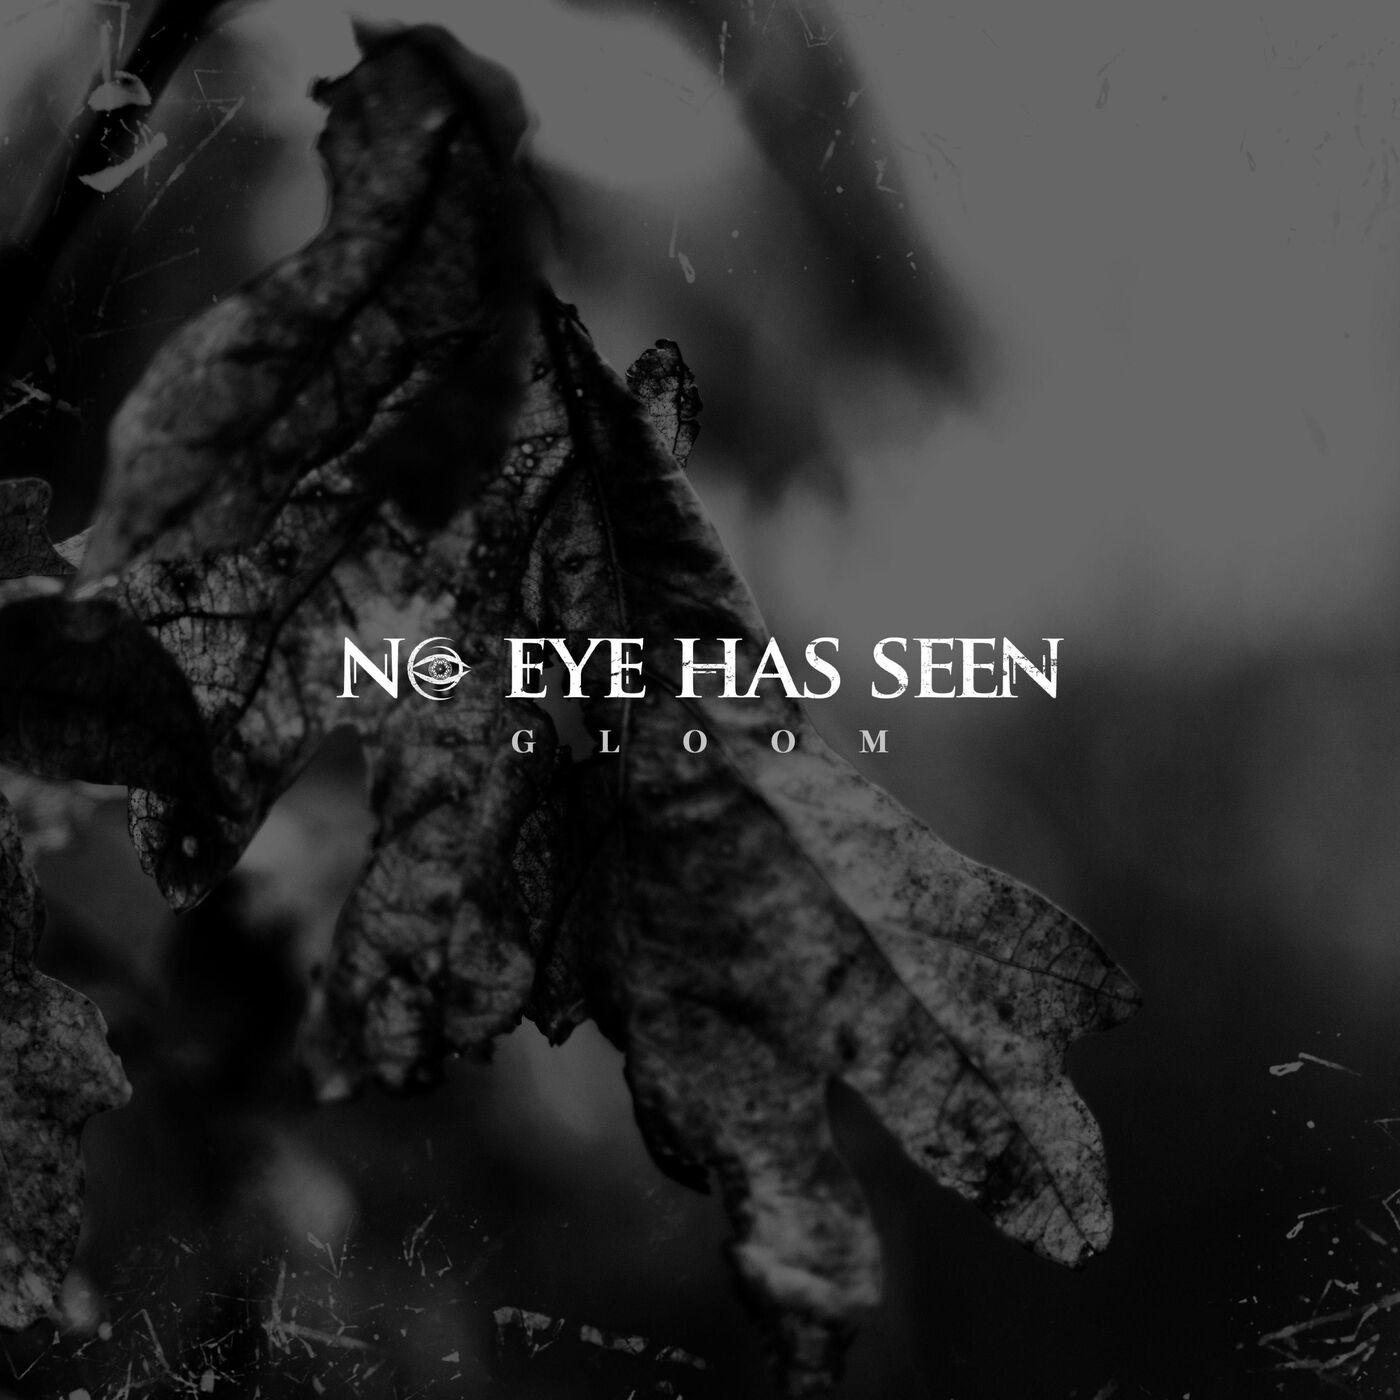 No Eye Has Seen - Gloom [single] (2020)